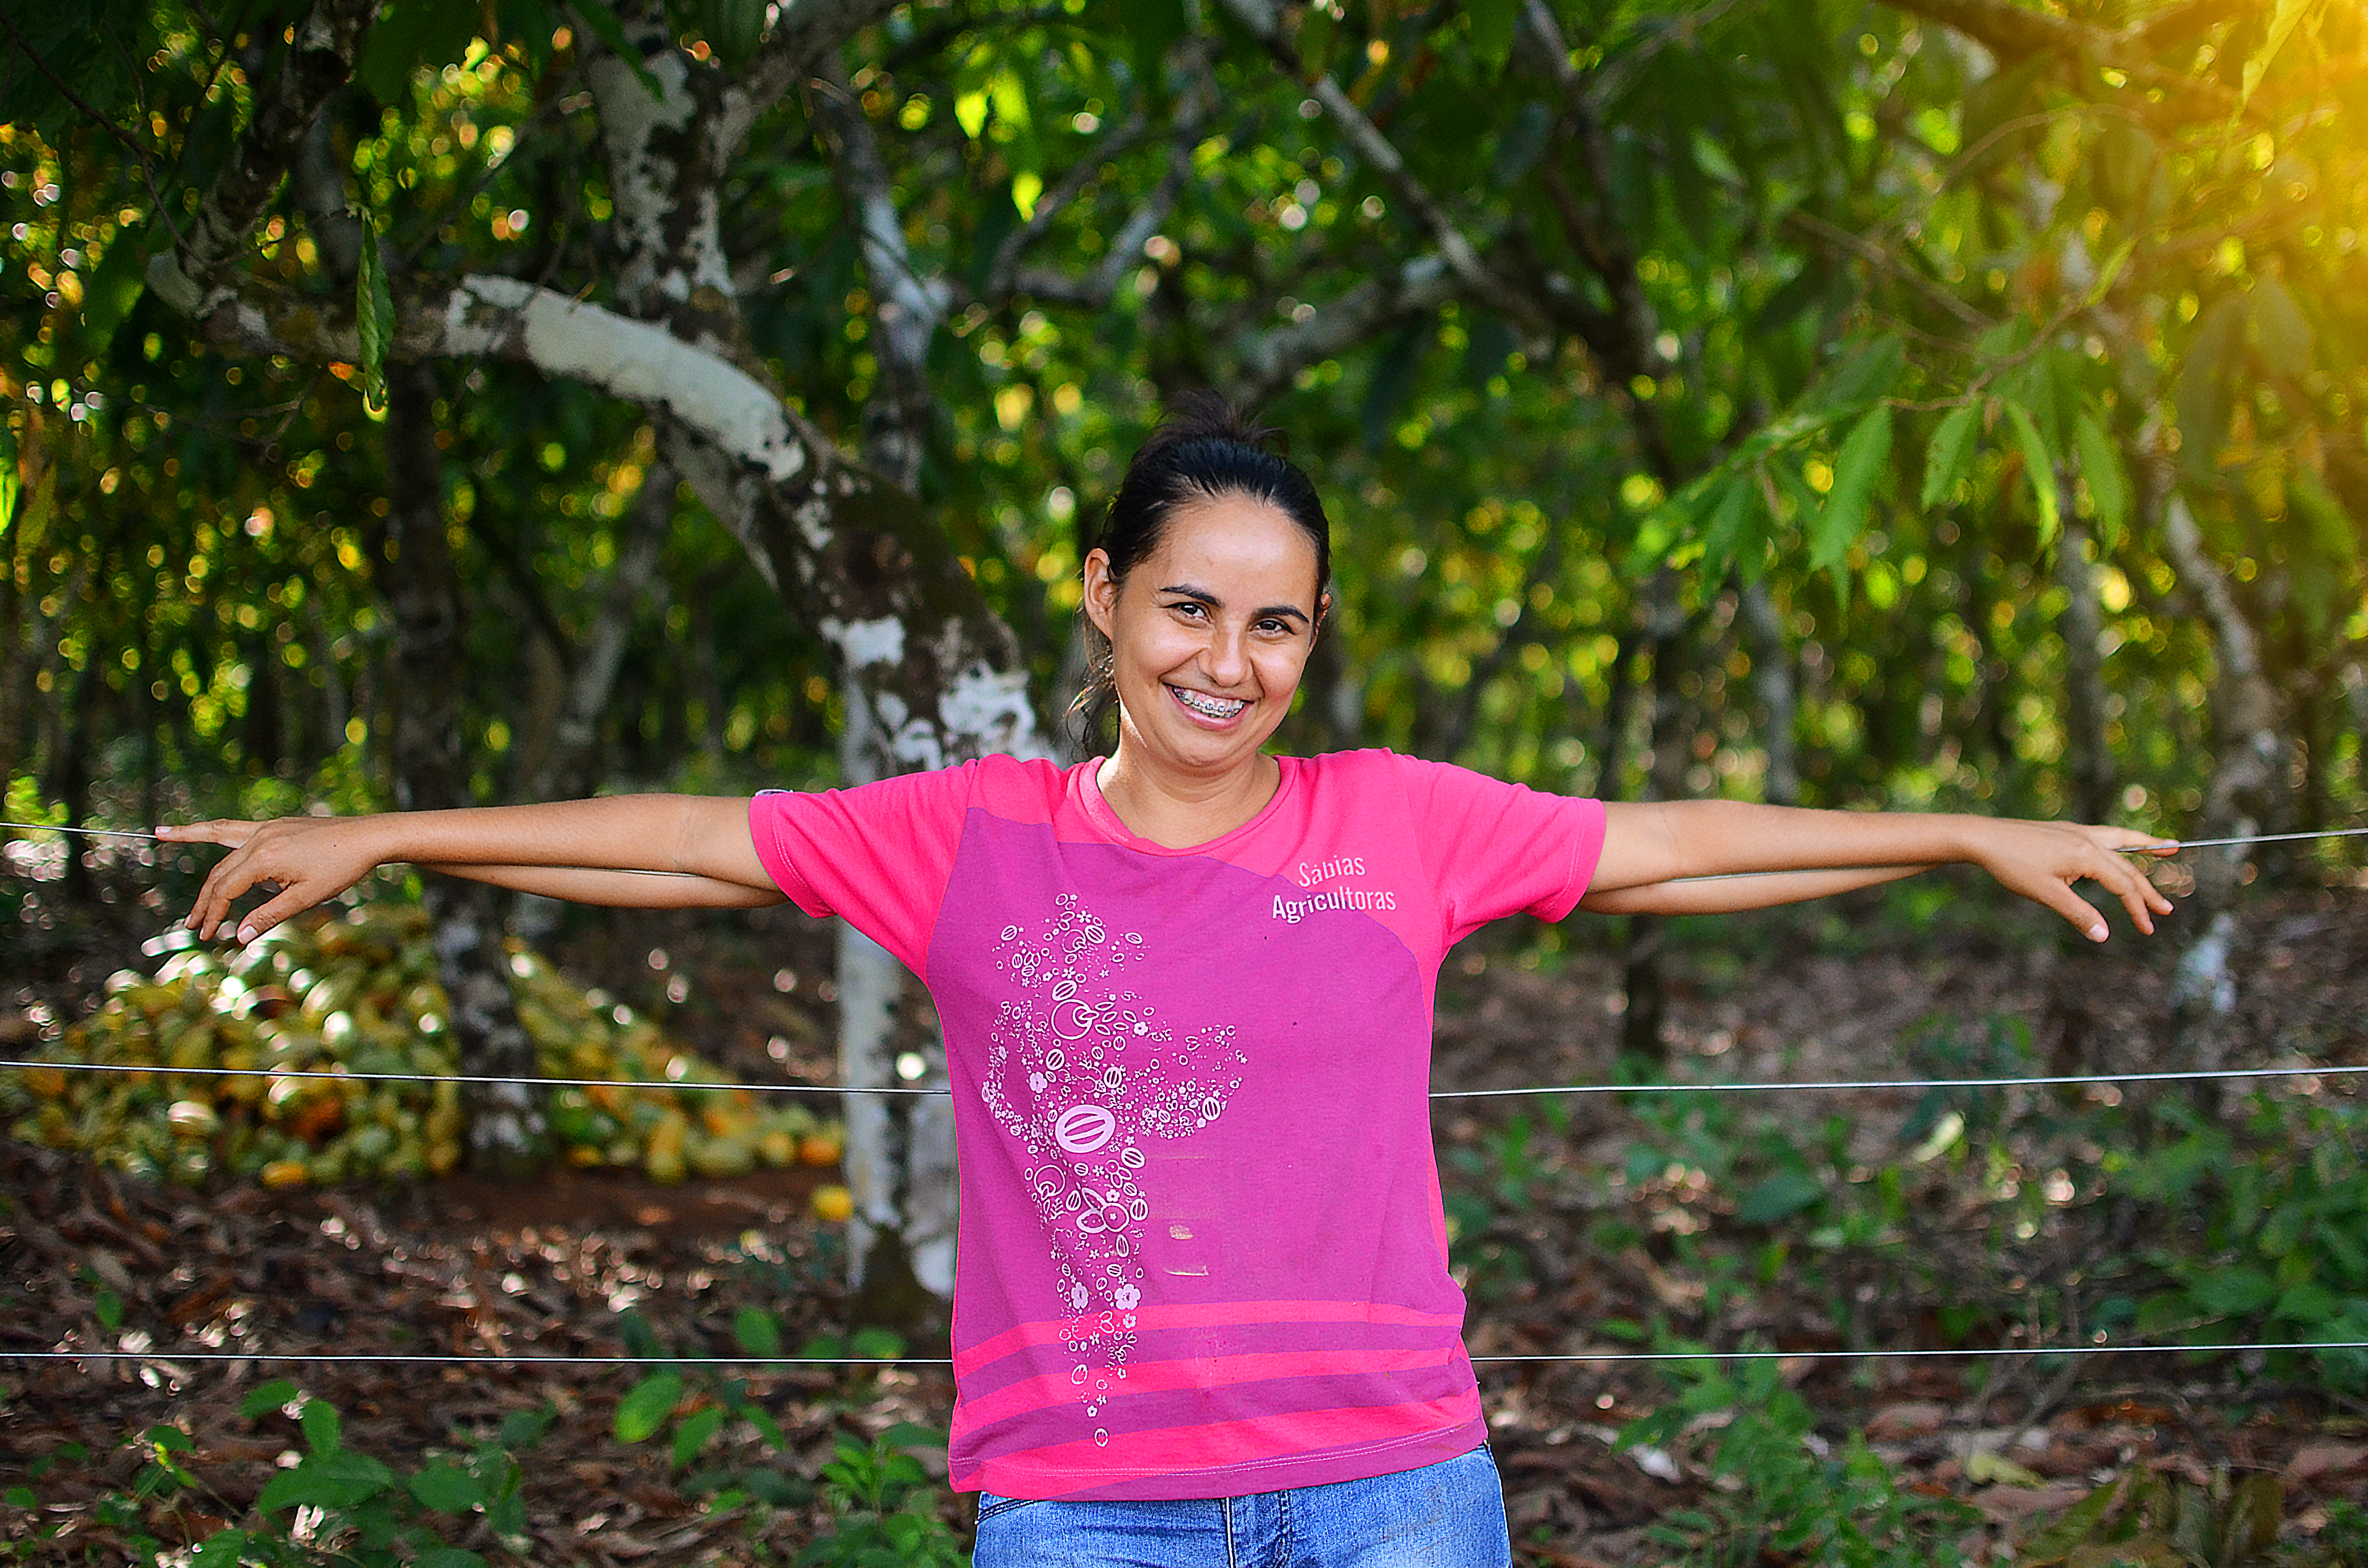 Empreendedorismo rural impulsiona autonomia a mulheres de São Félix do Xingu